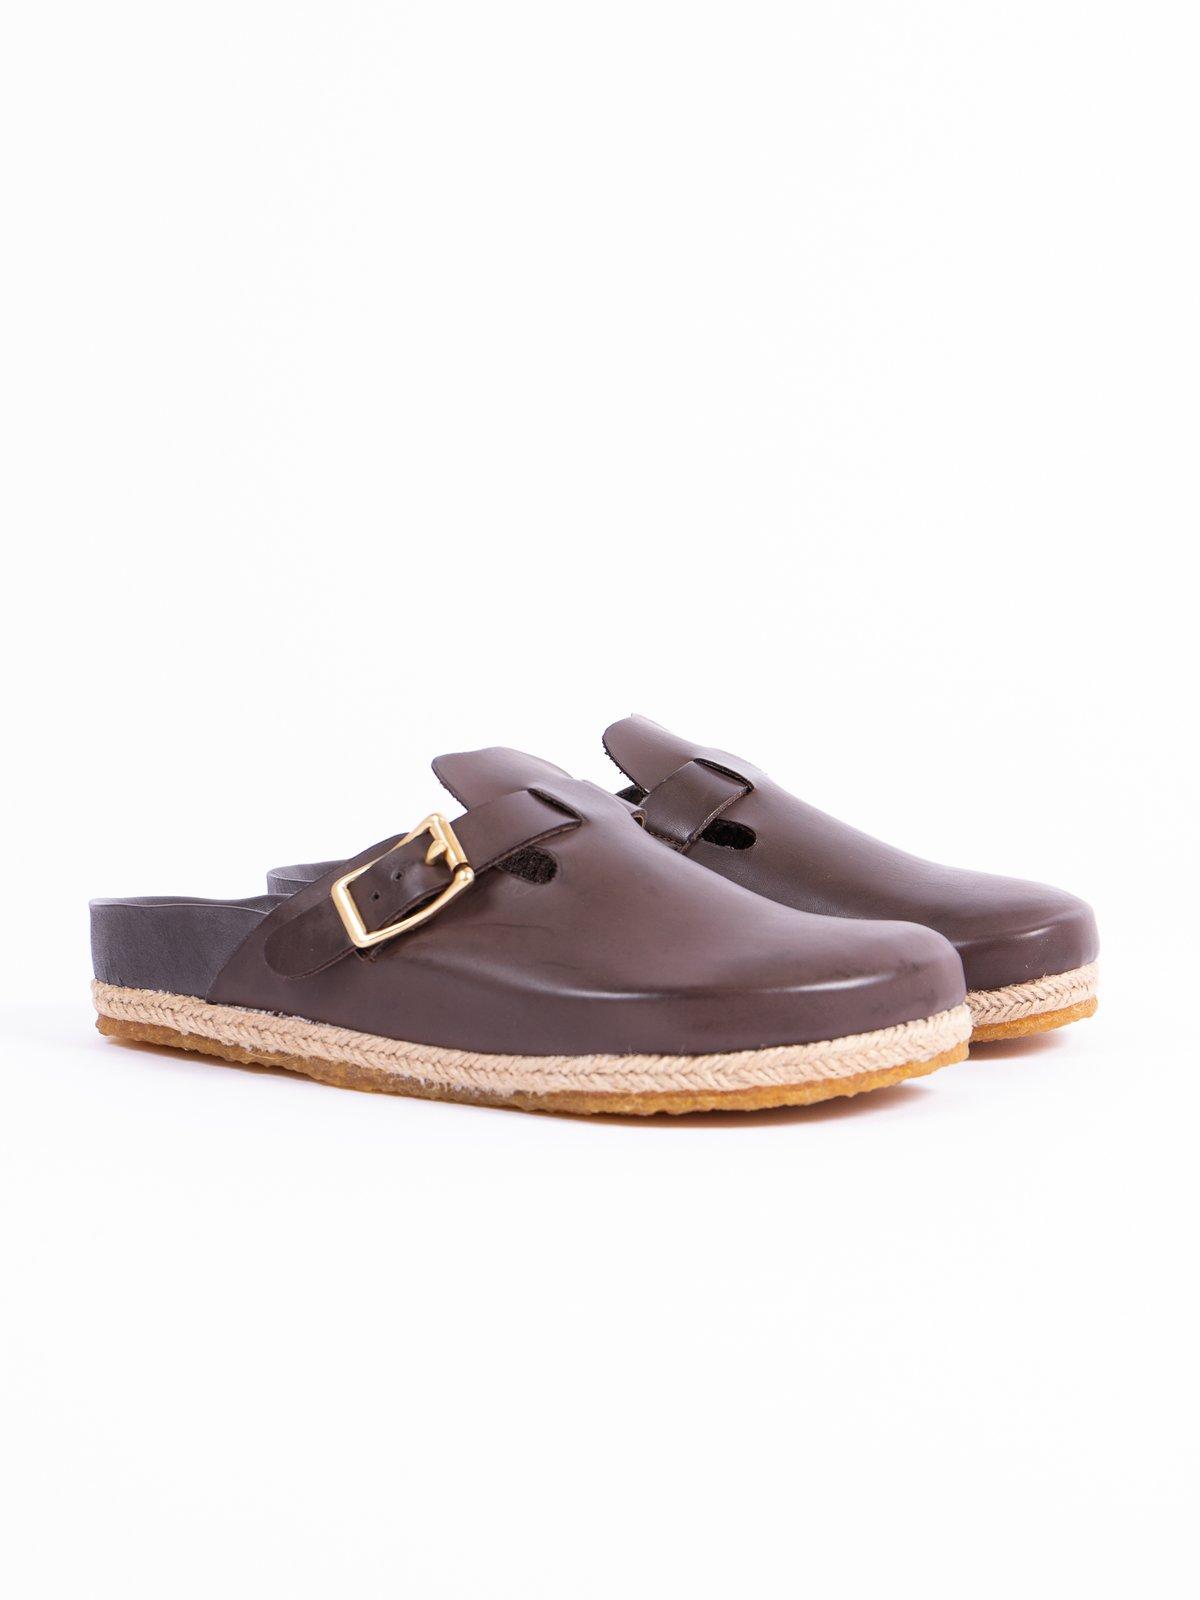 Brown Bostonian Sandal - Image 1